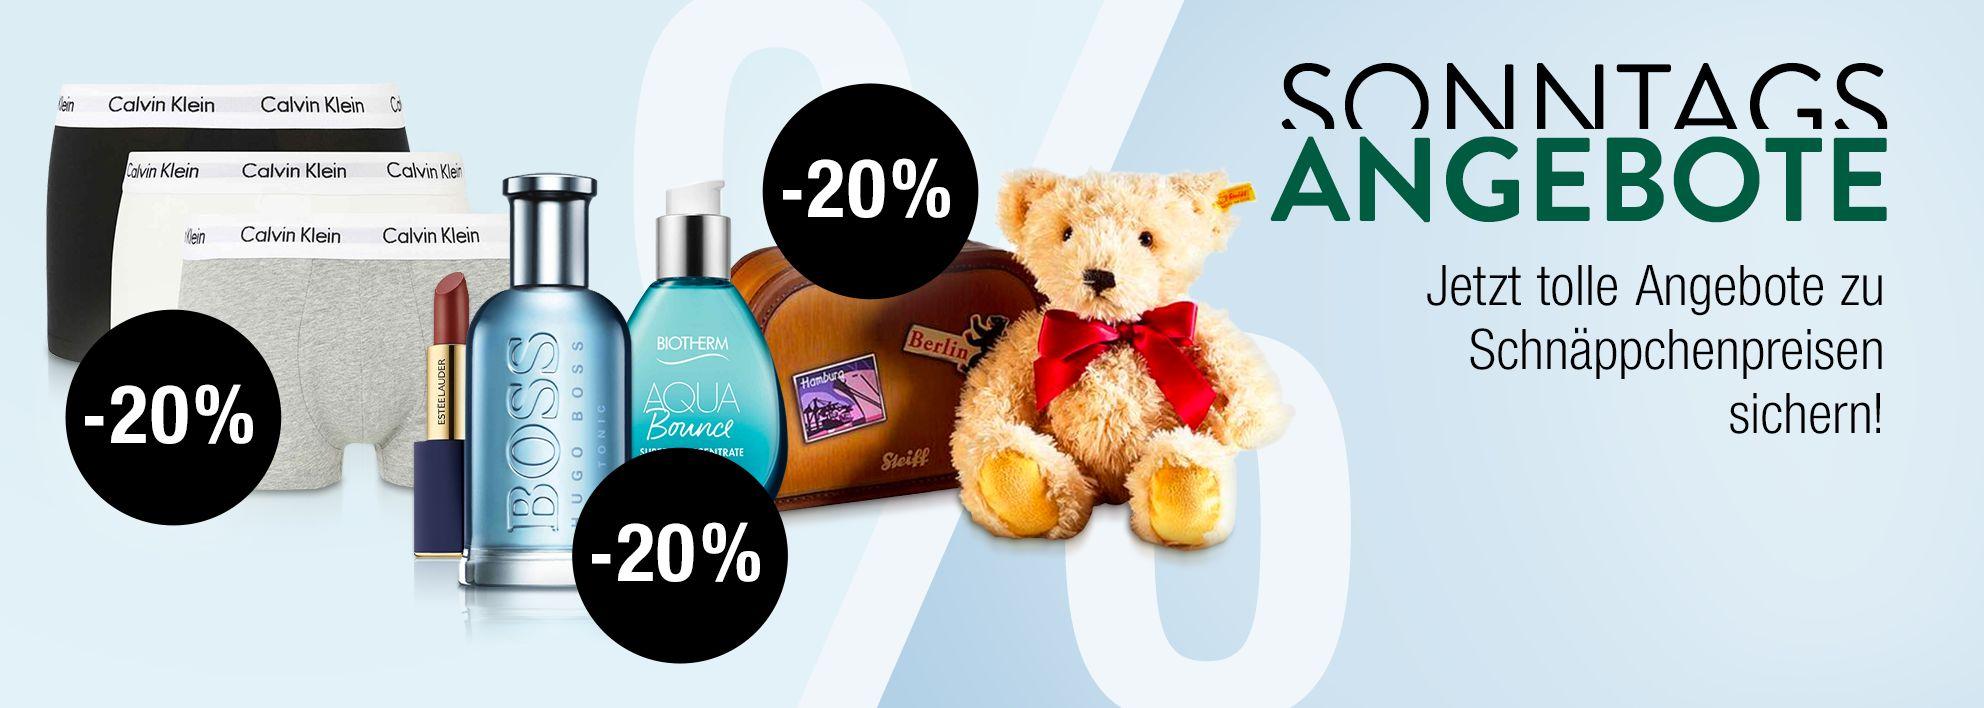 Bild zu Galeria Kaufhof Sonntags-Angebote, so z.B. 13% Rabatt auf Playmobil